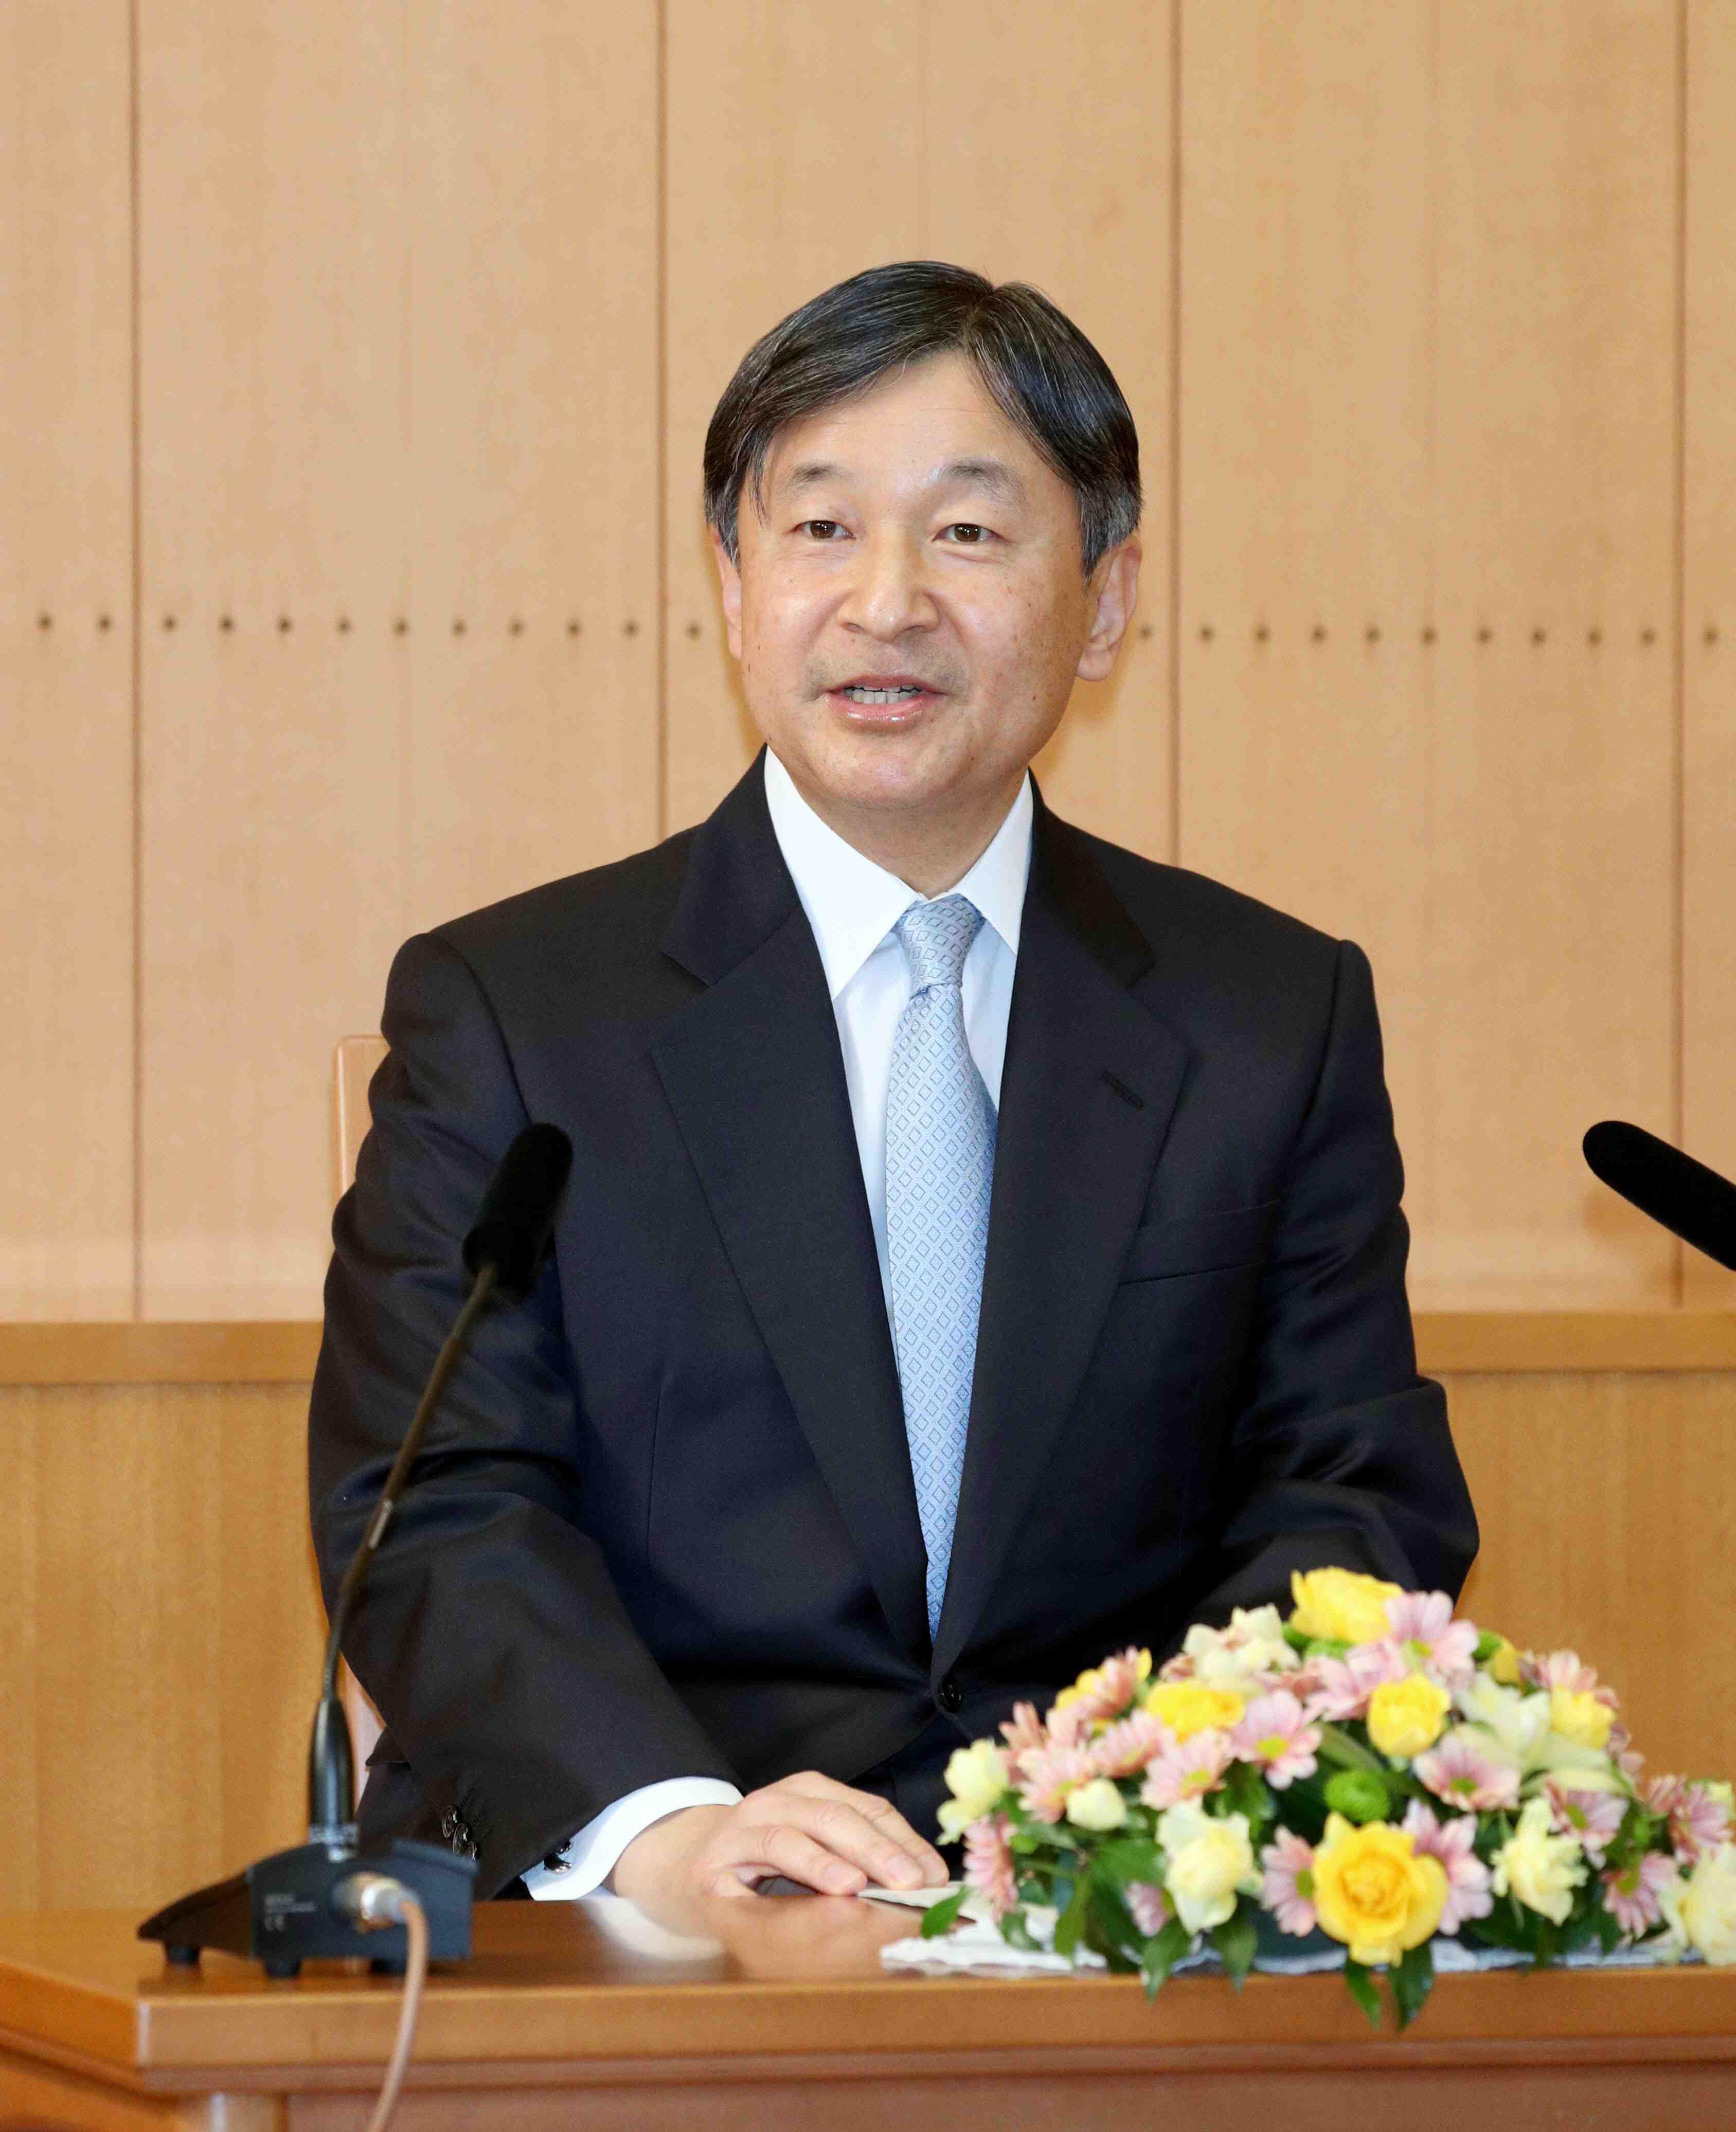 Japan Emperor 60th Birthday 020